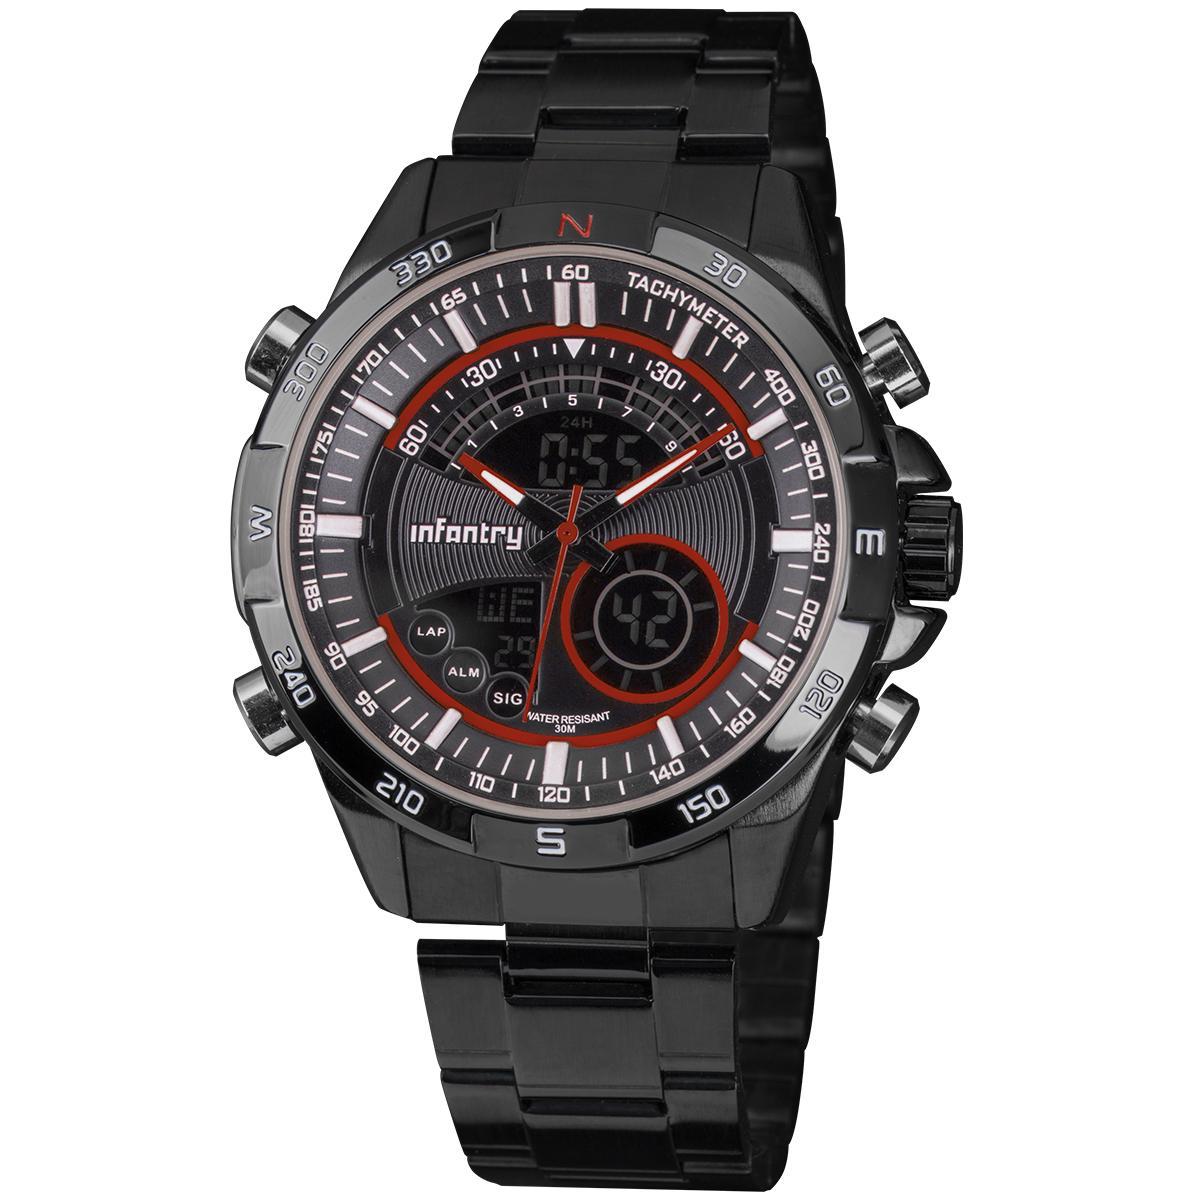 8cec9248bf80 Infantry Men s Digital Dual Wrist Watch Date Stopwatch Black Stainless  Steel Red